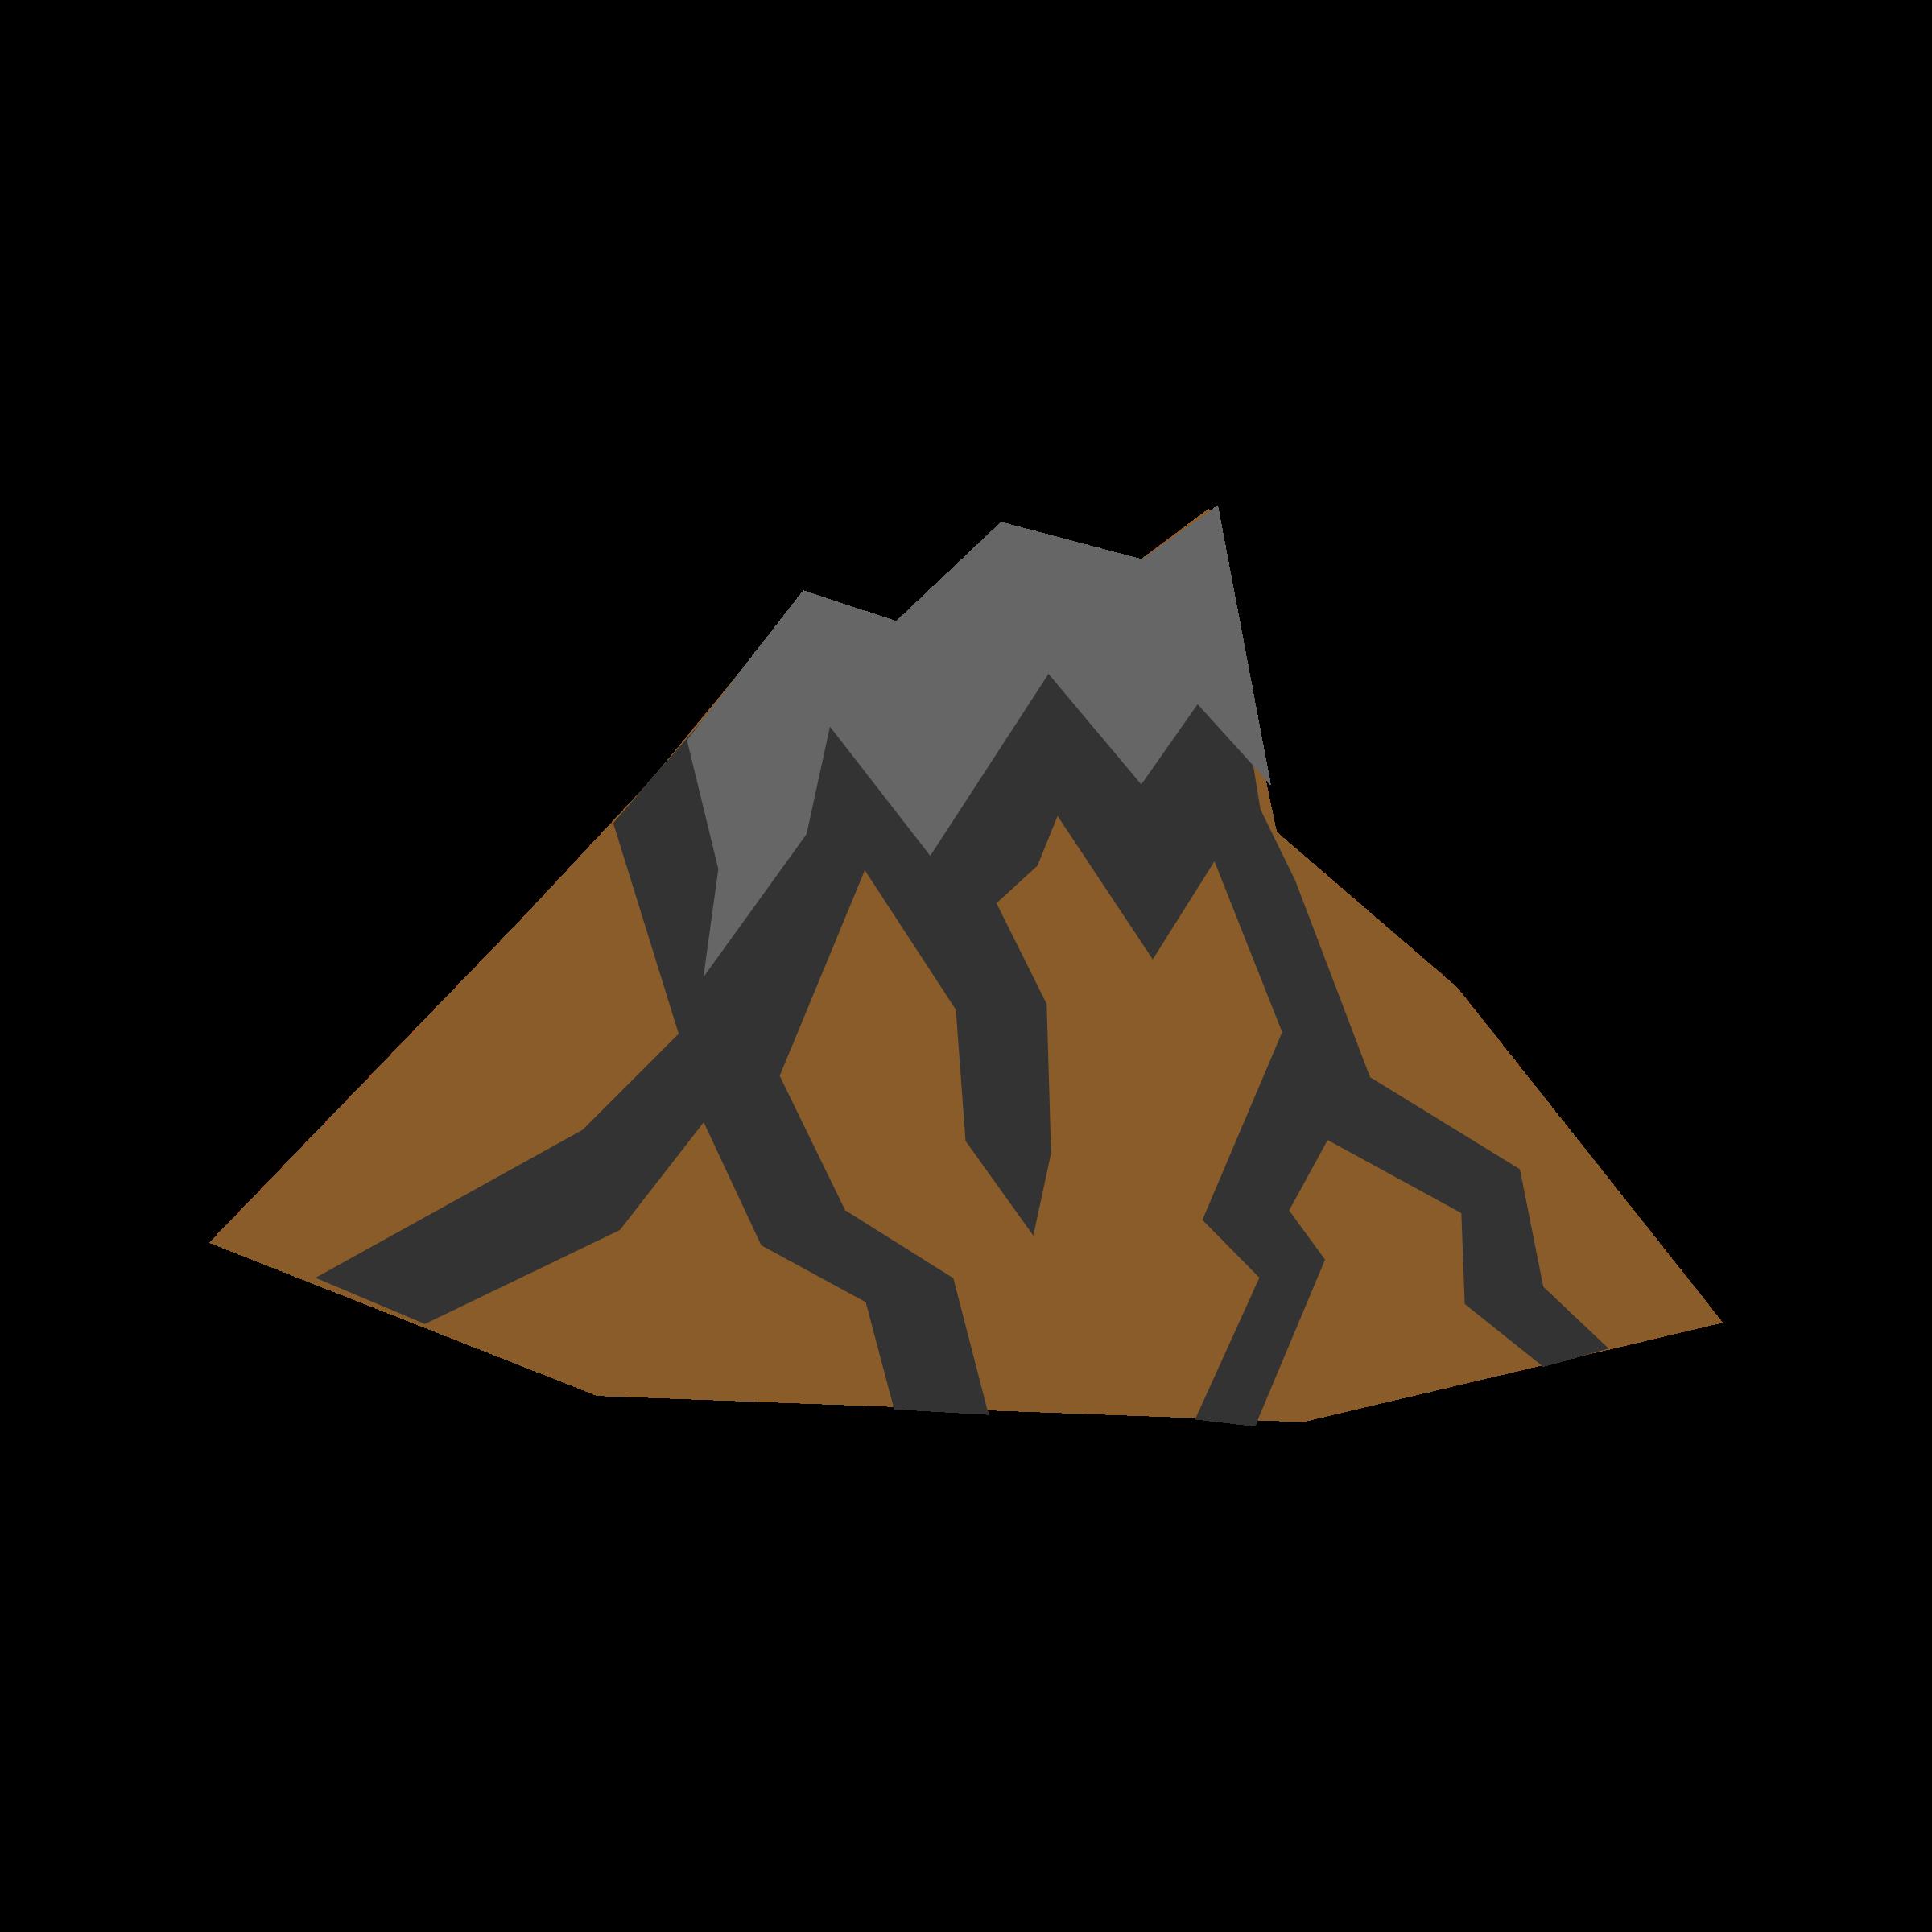 Volcano clip art vector free